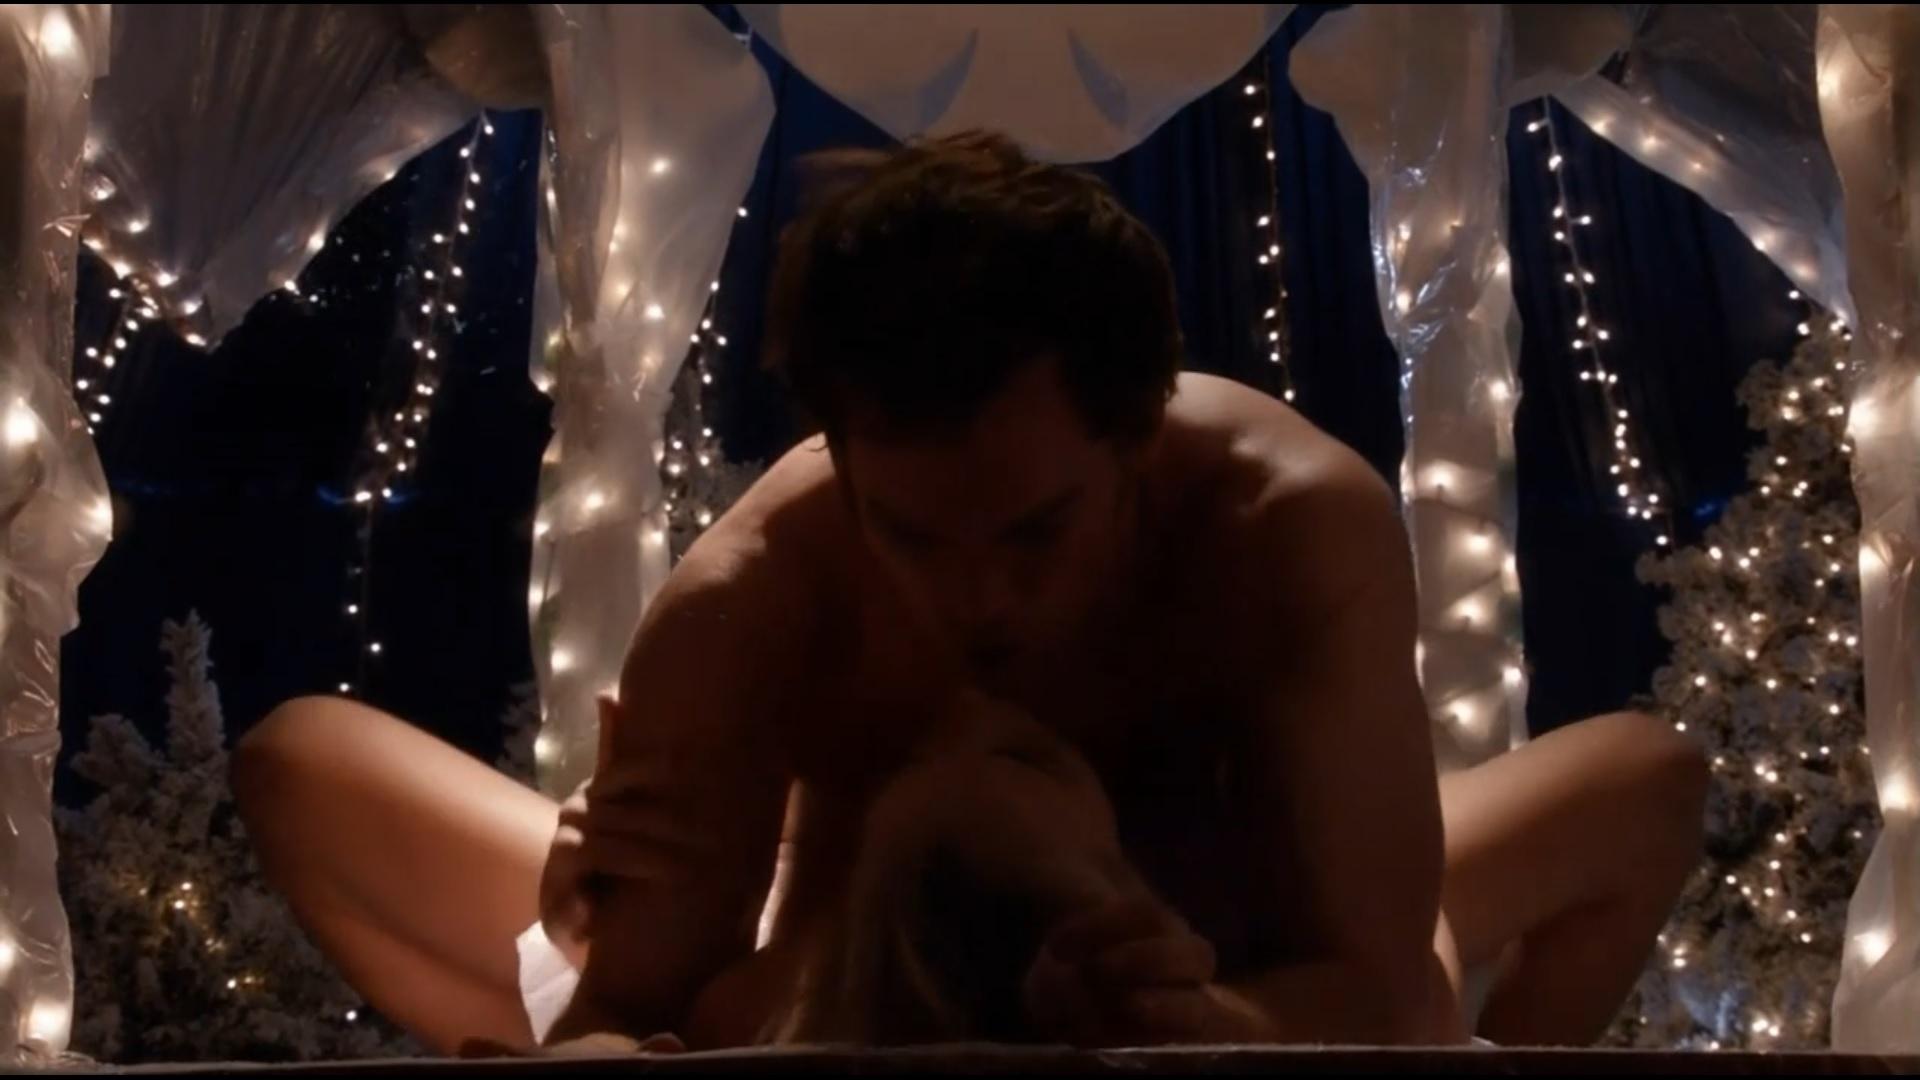 Yvonne strahovski nude body and sex scene in dexter - 1 part 1